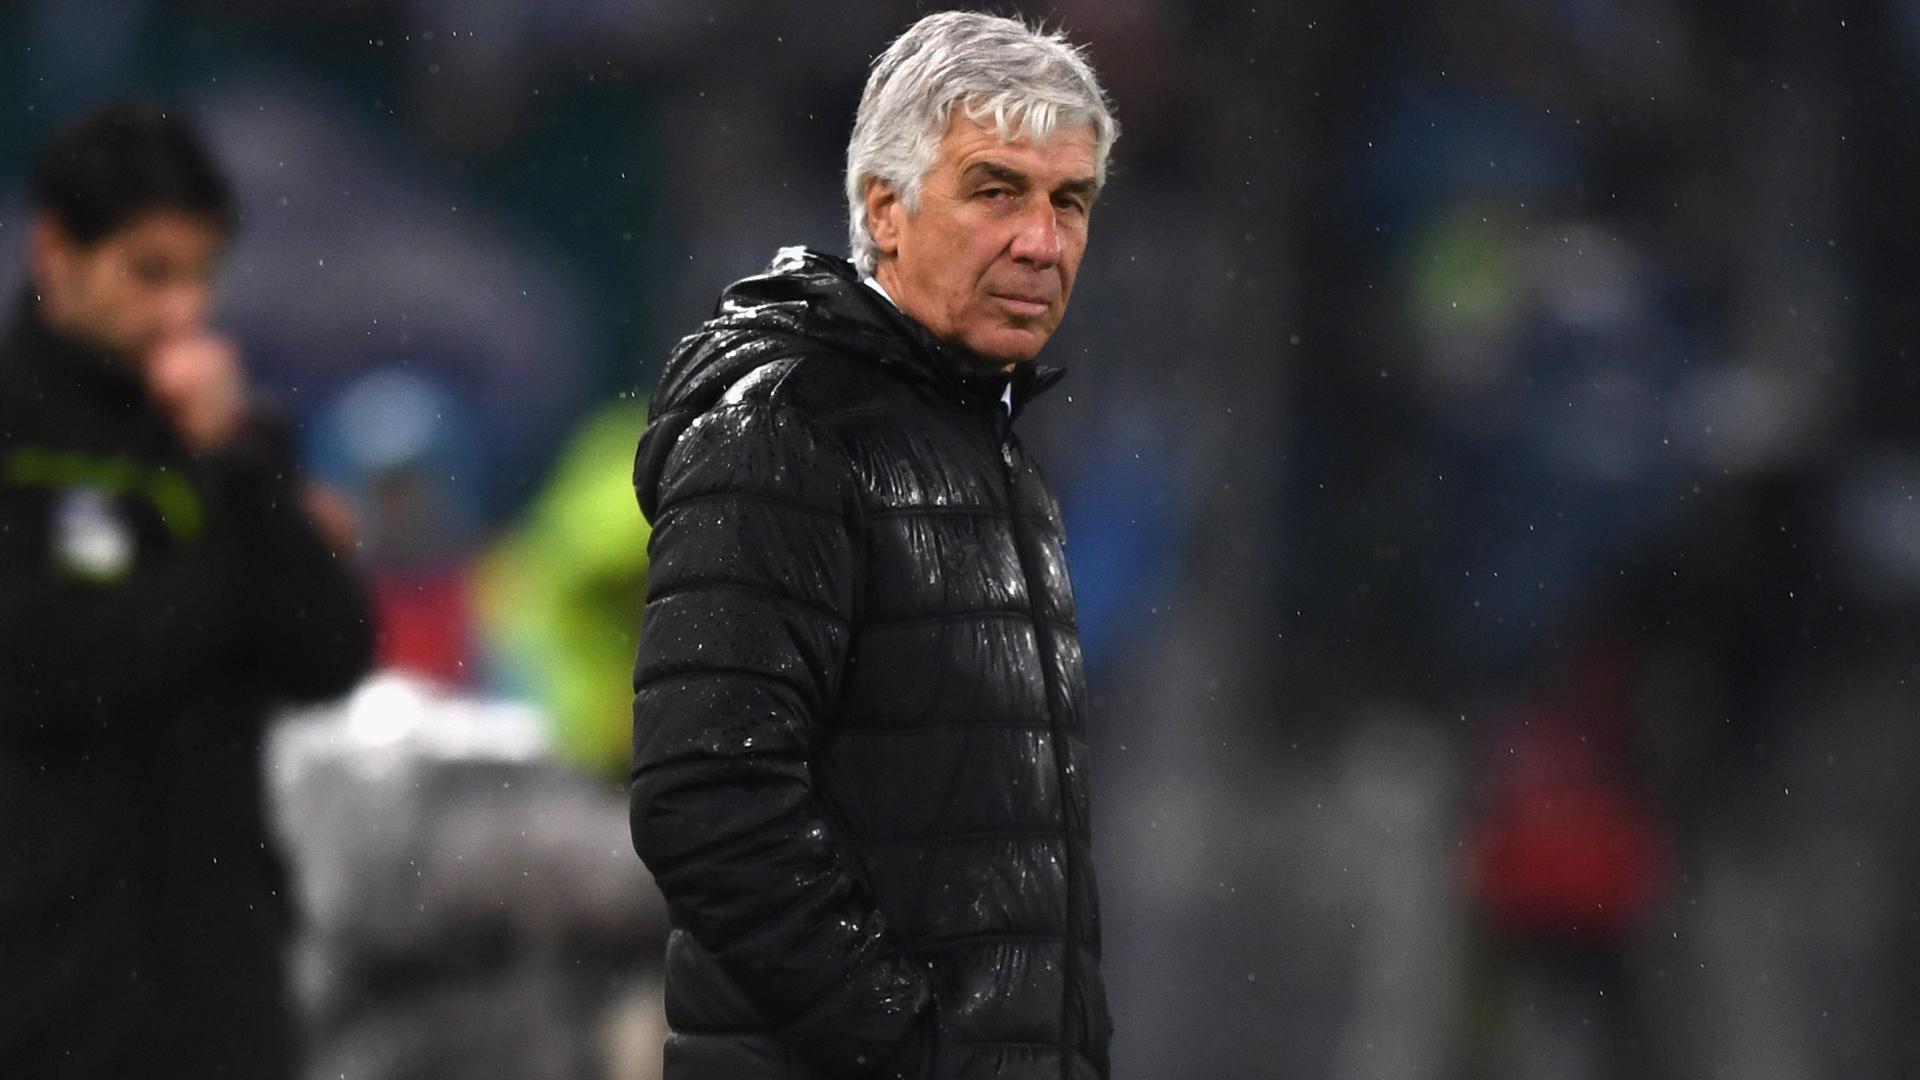 Atalanta head coach Gian Piero Gasperini blasted officials after a Coppa Italia final defeat to Lazio.